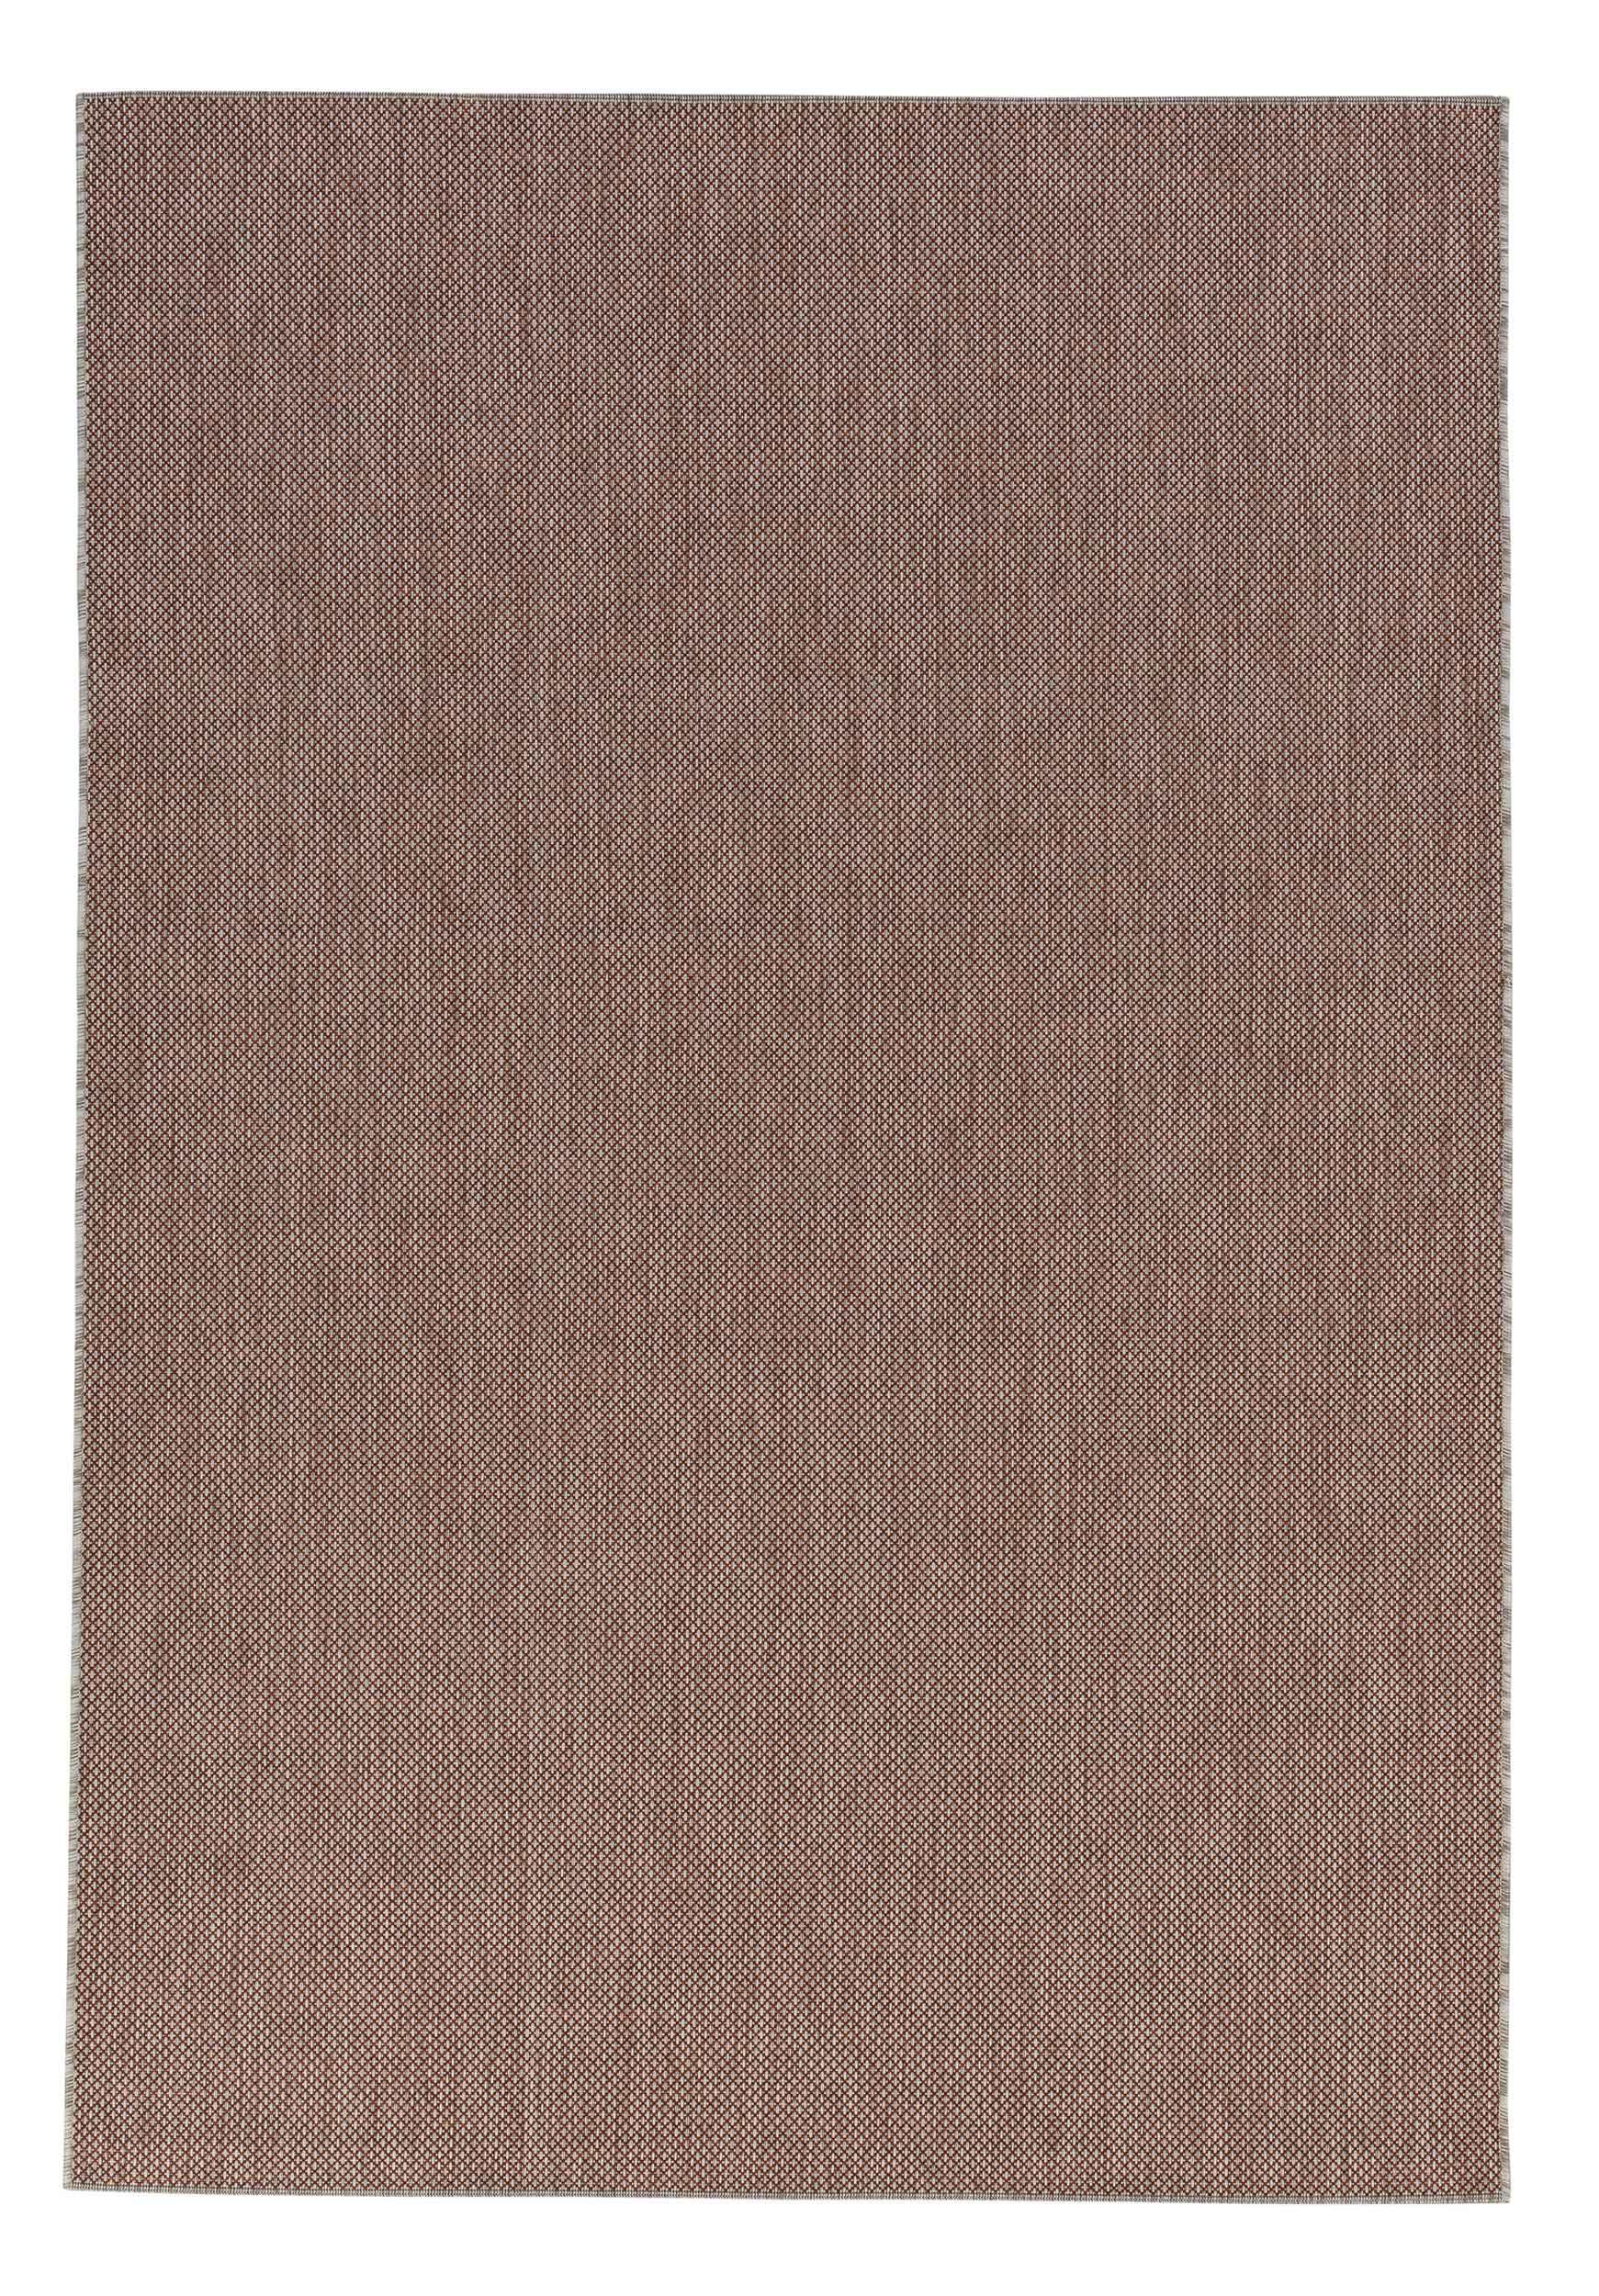 Outdoor Teppich 67x130cm   RHO